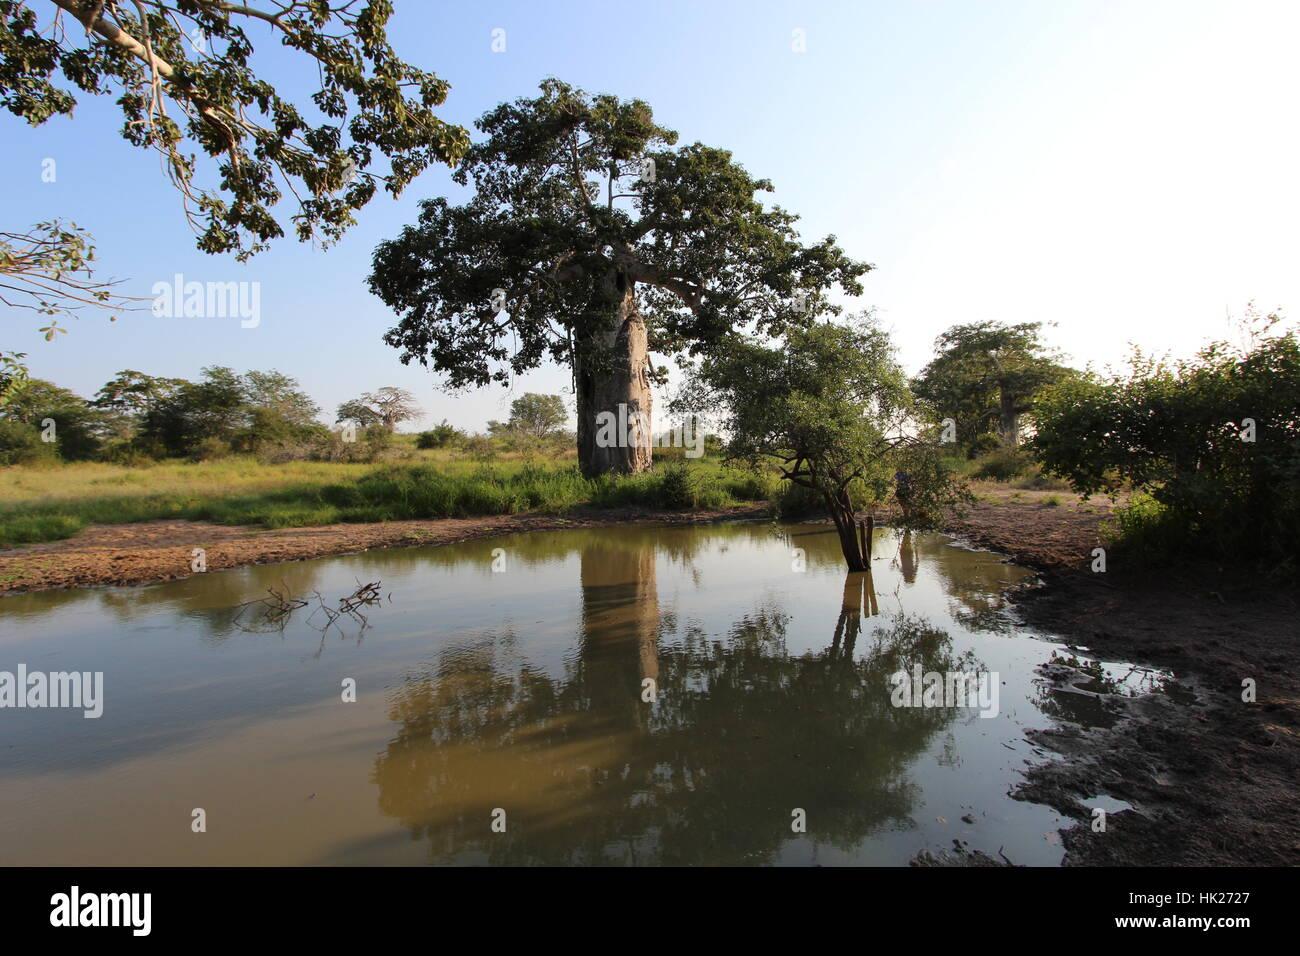 Big and wonderful Baobab at the Kissama National Park - Angola, Africa Stock Photo